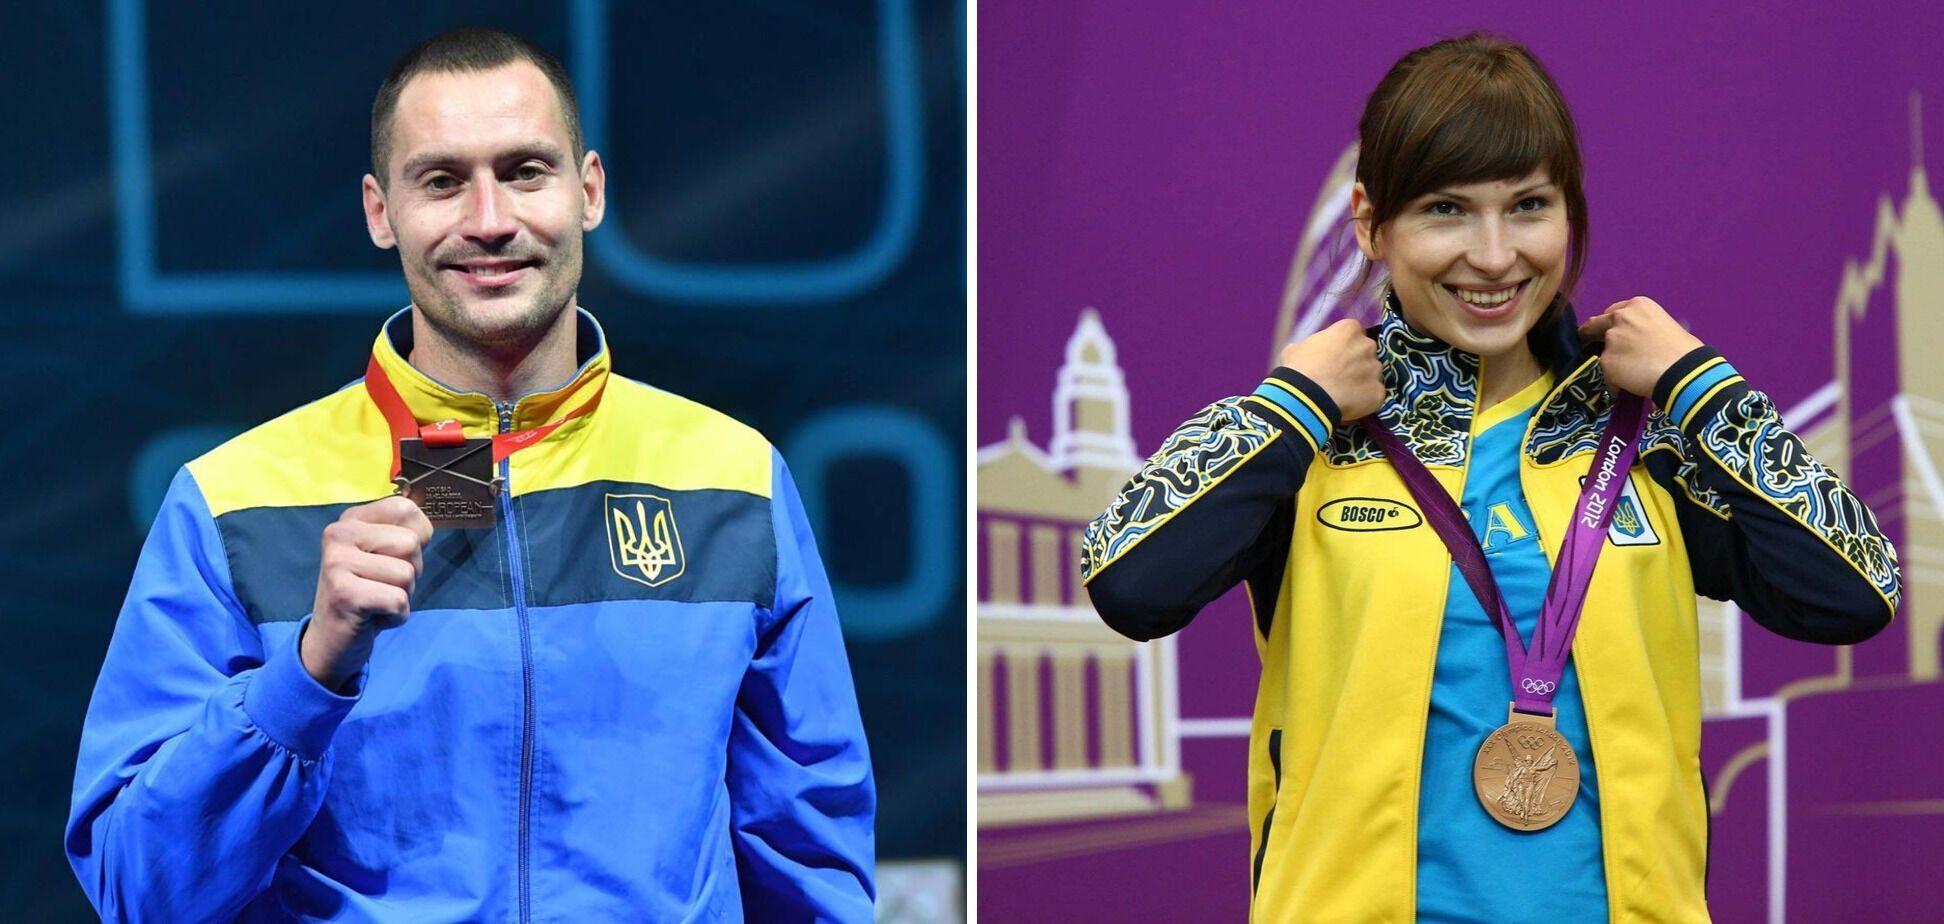 Богдан Никишин и Елена Костевич